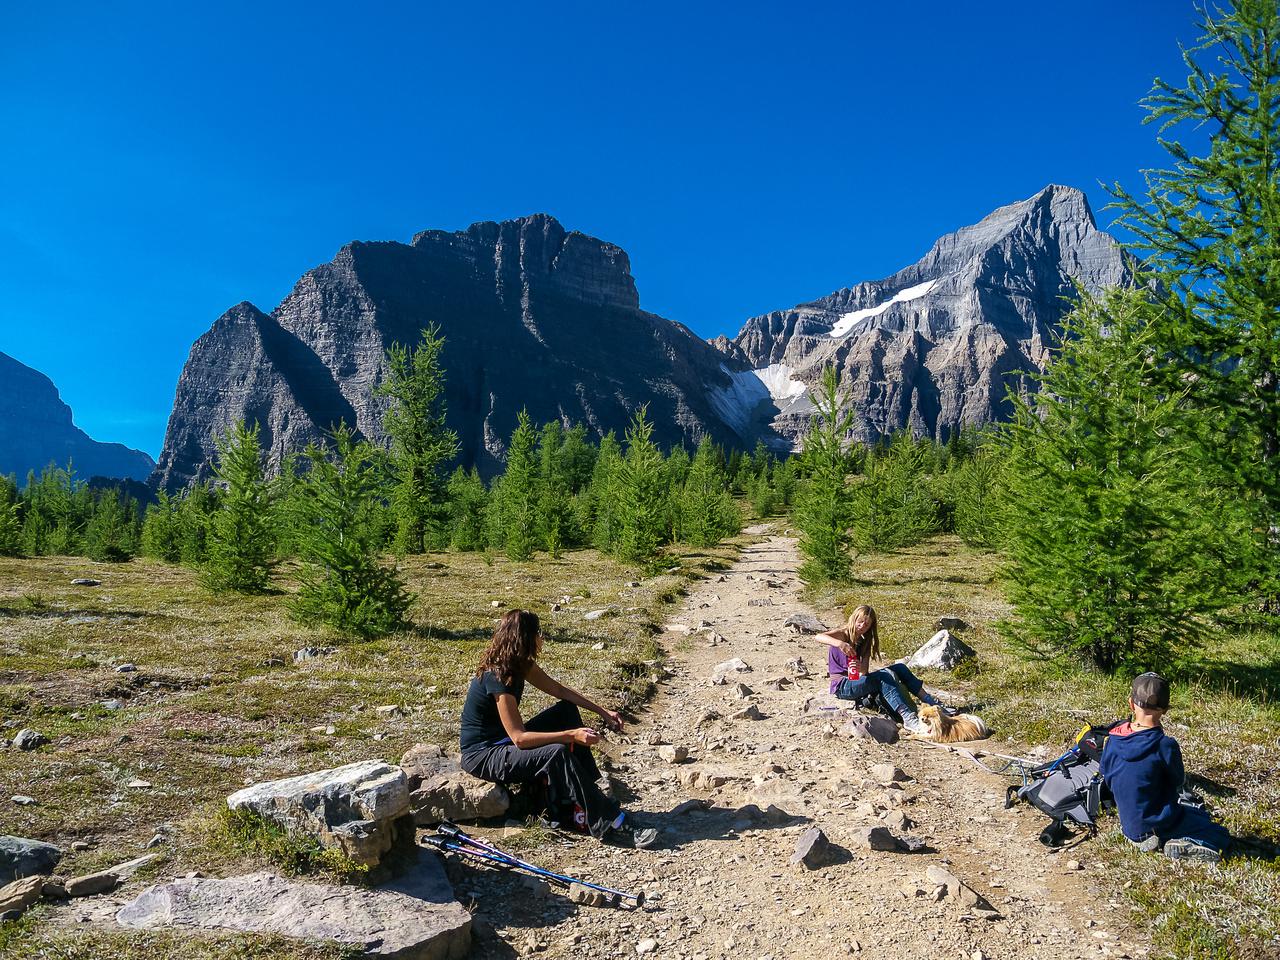 Taking a break at Saddleback Pass looking at Sheol Mountain (L) and Haddo Peak (R).